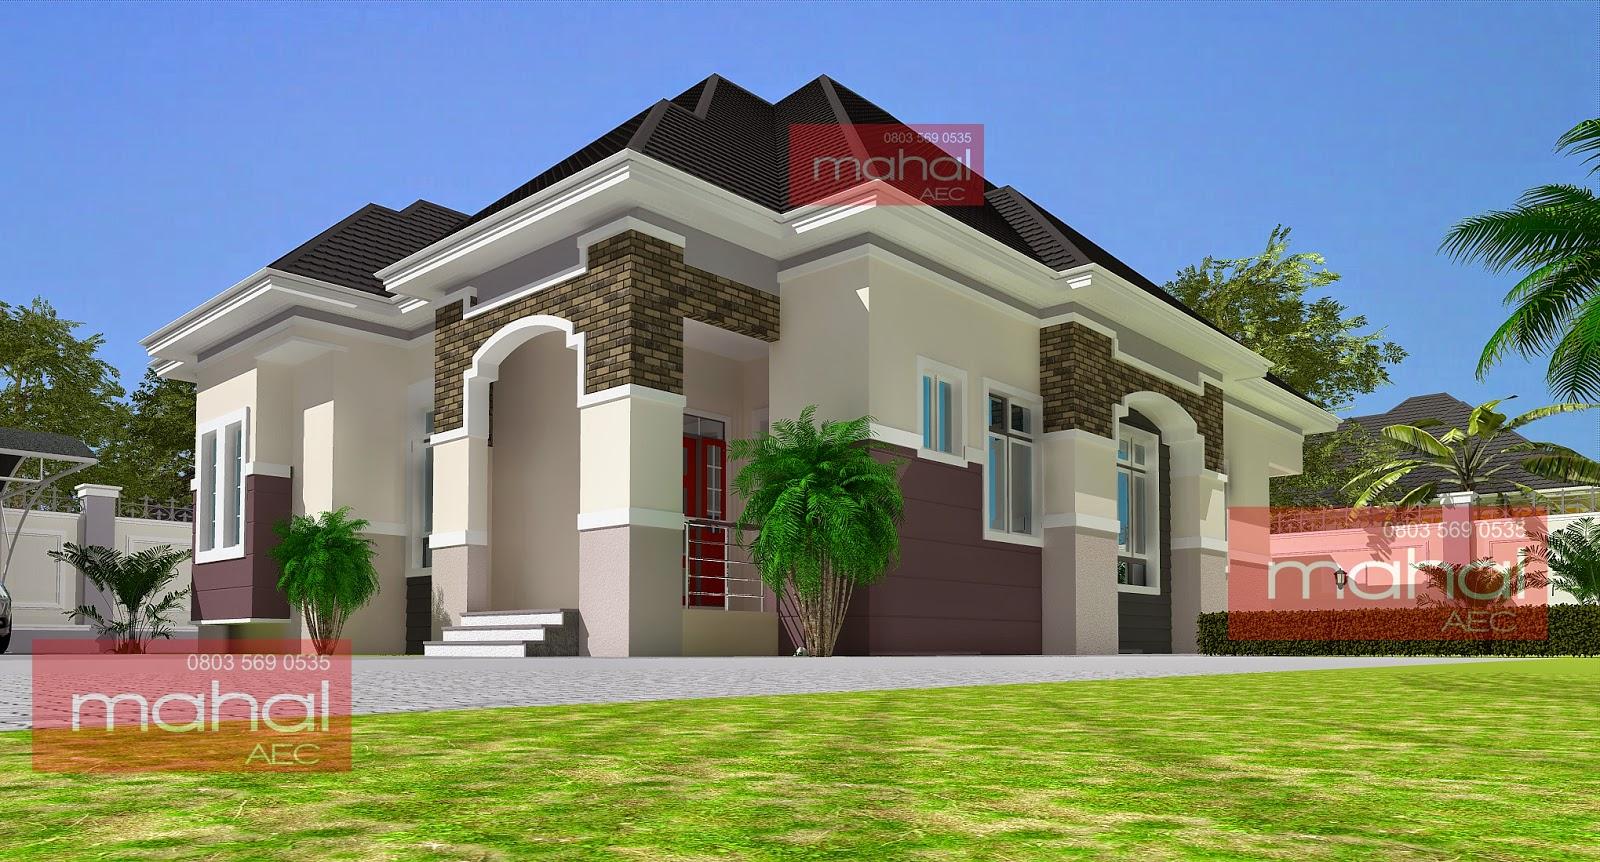 Nigeria Morden House